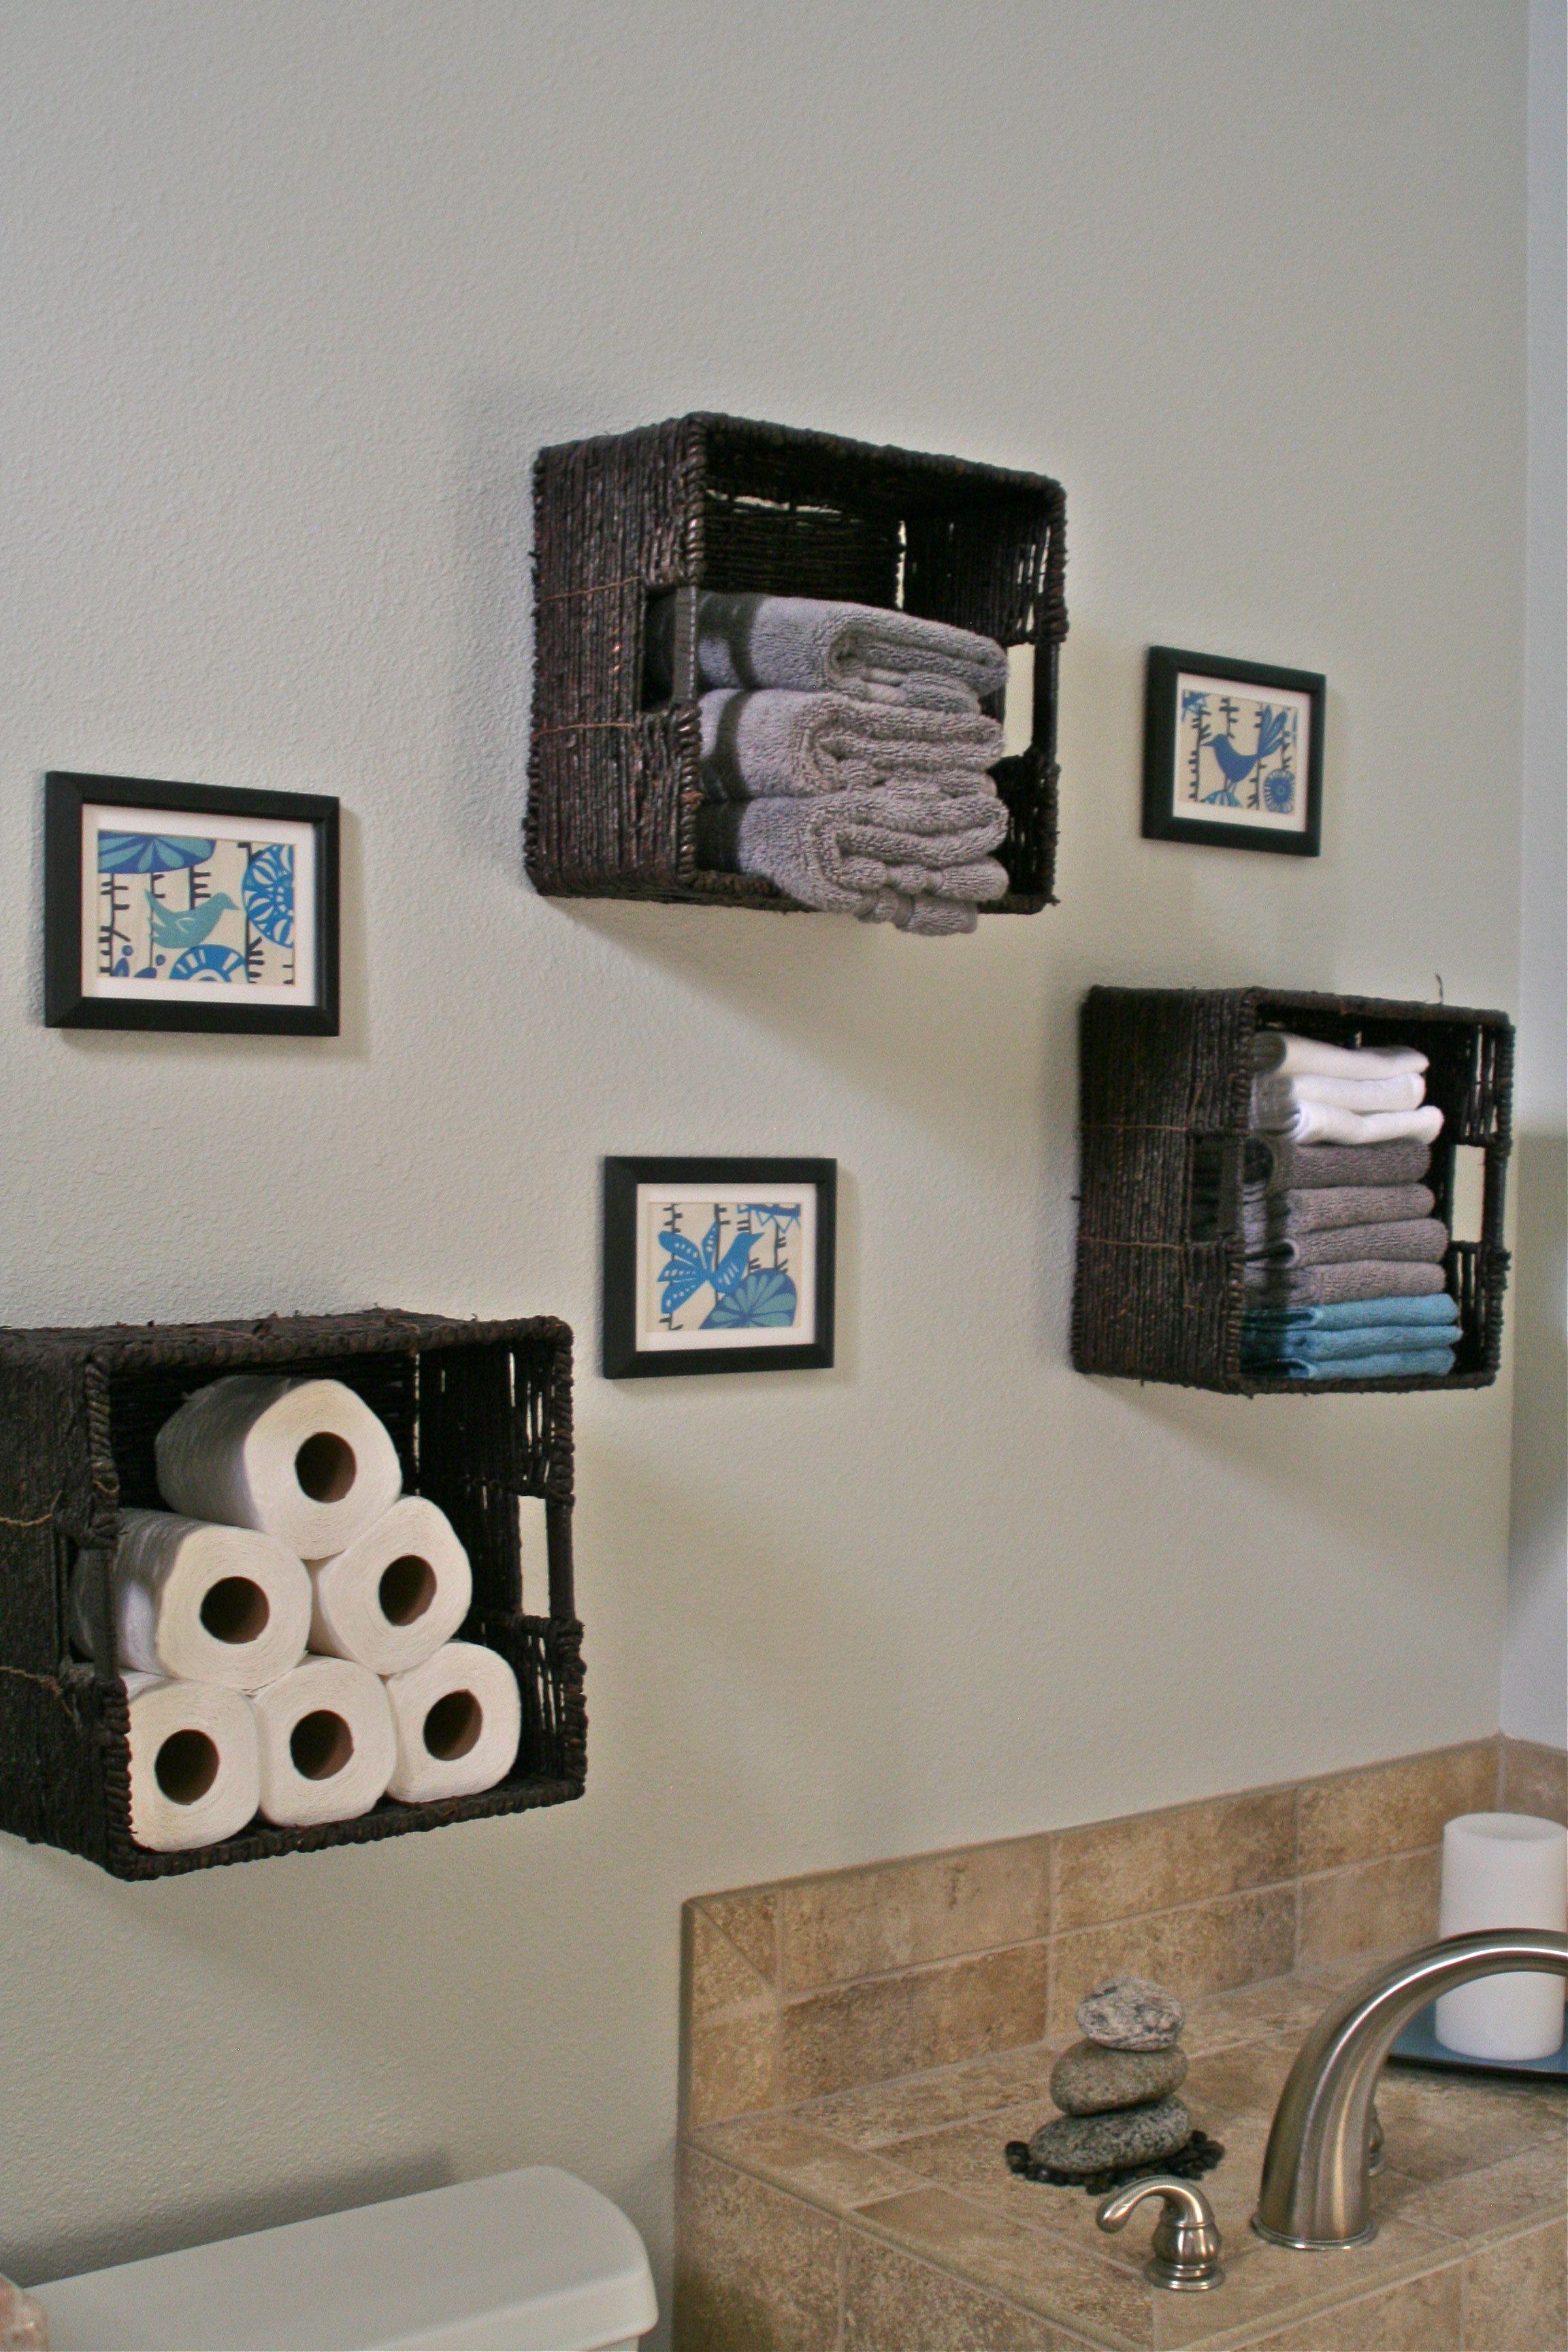 Home Dsgn Designing Home Inspiration Bathroom Basket Storage Bathroom Storage Organization Bathroom Wall Decor